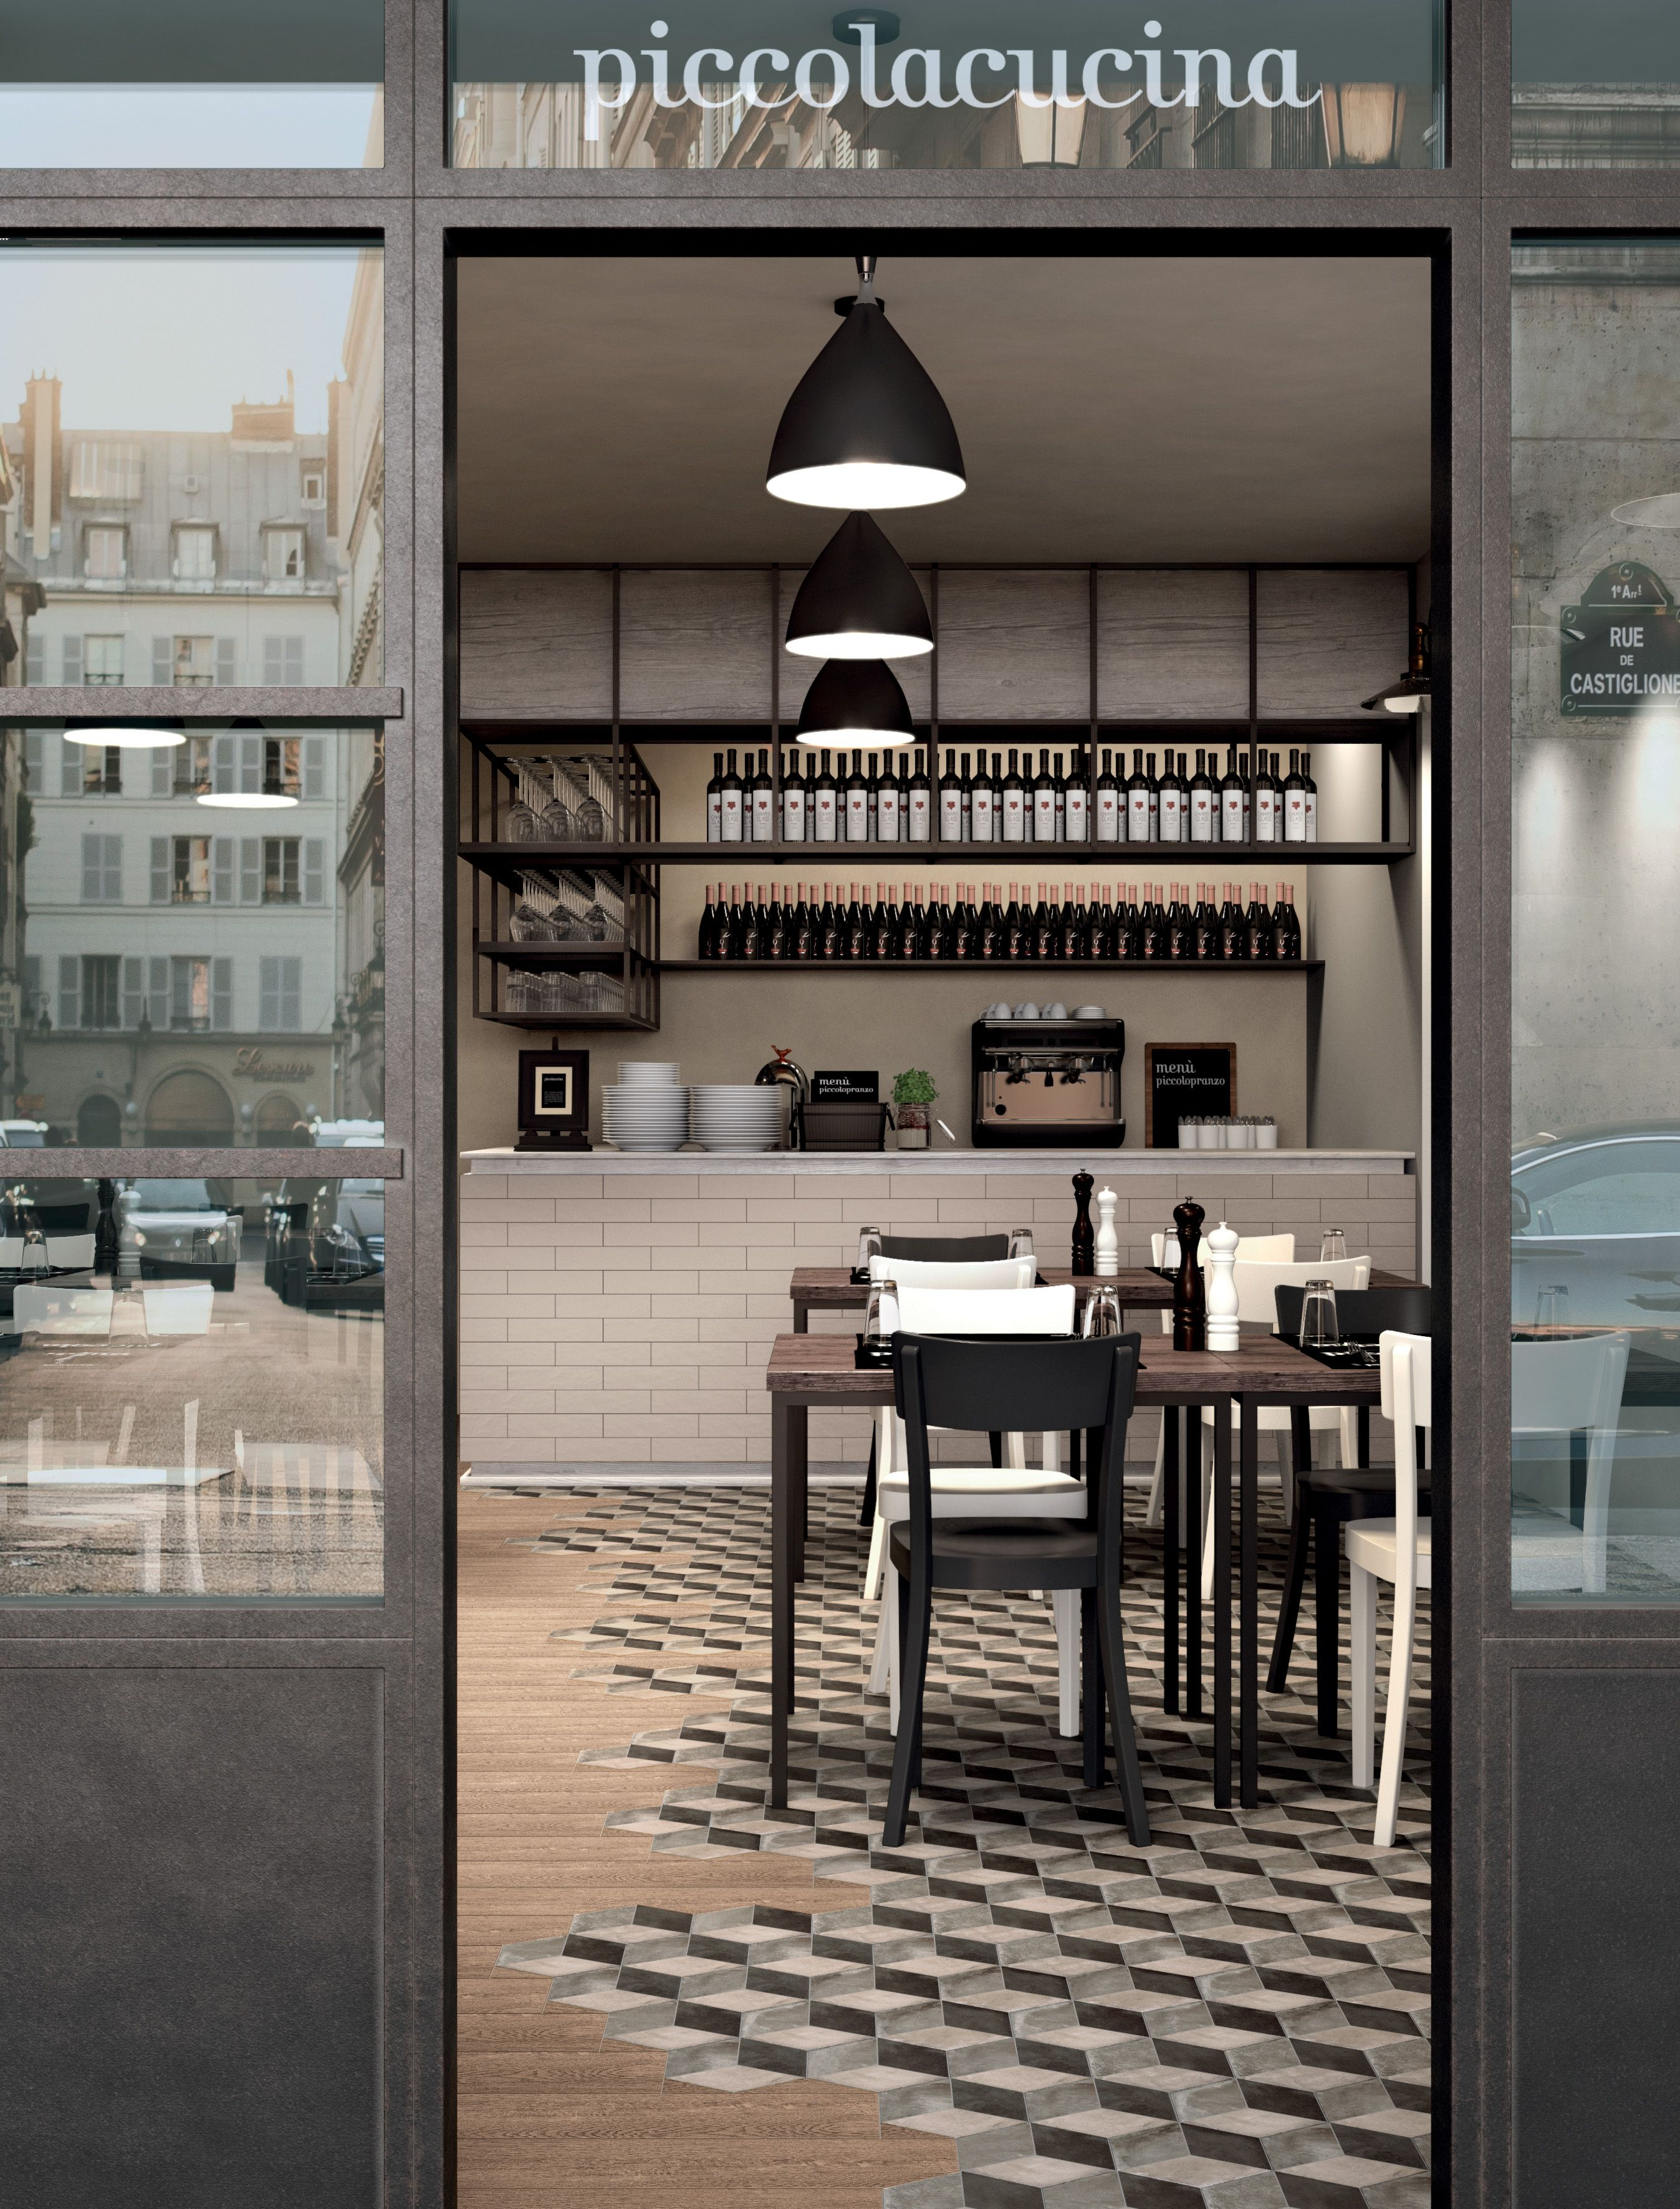 ginardi arredamenti | marca corona 1741 | pinterest | cement, tile